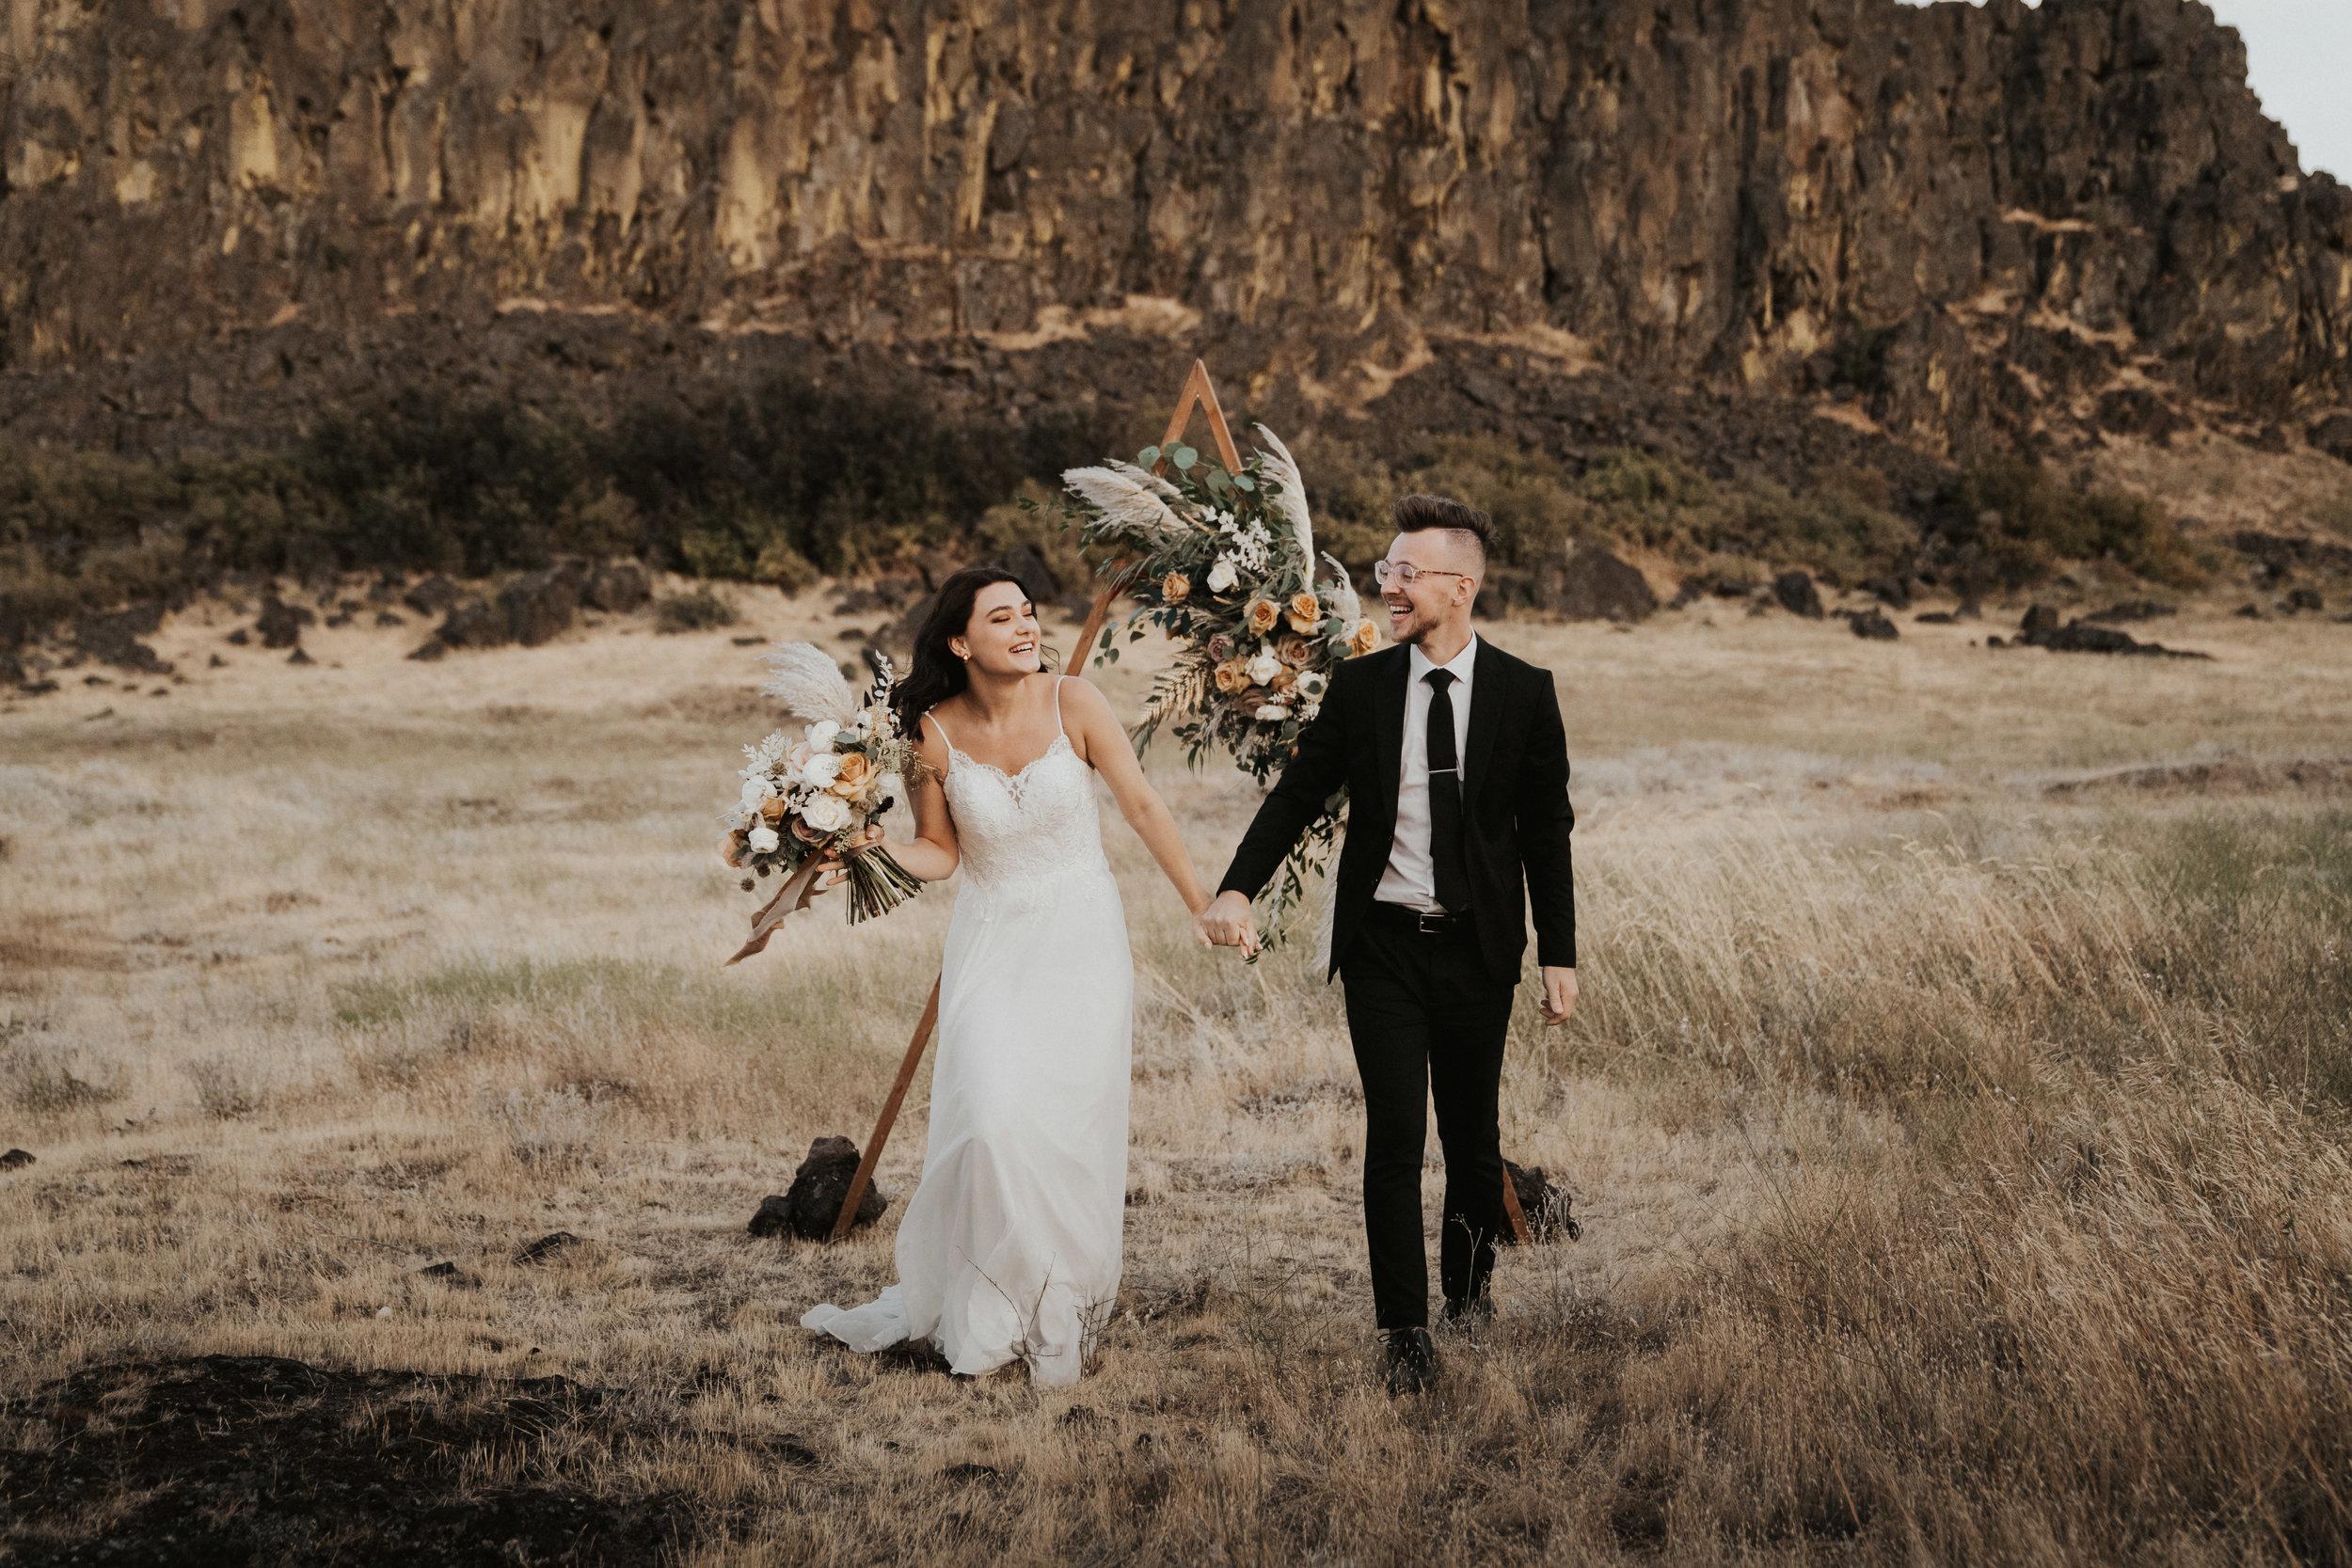 columbia-river-gorge-wedding-elopement-inspiration-25.jpg